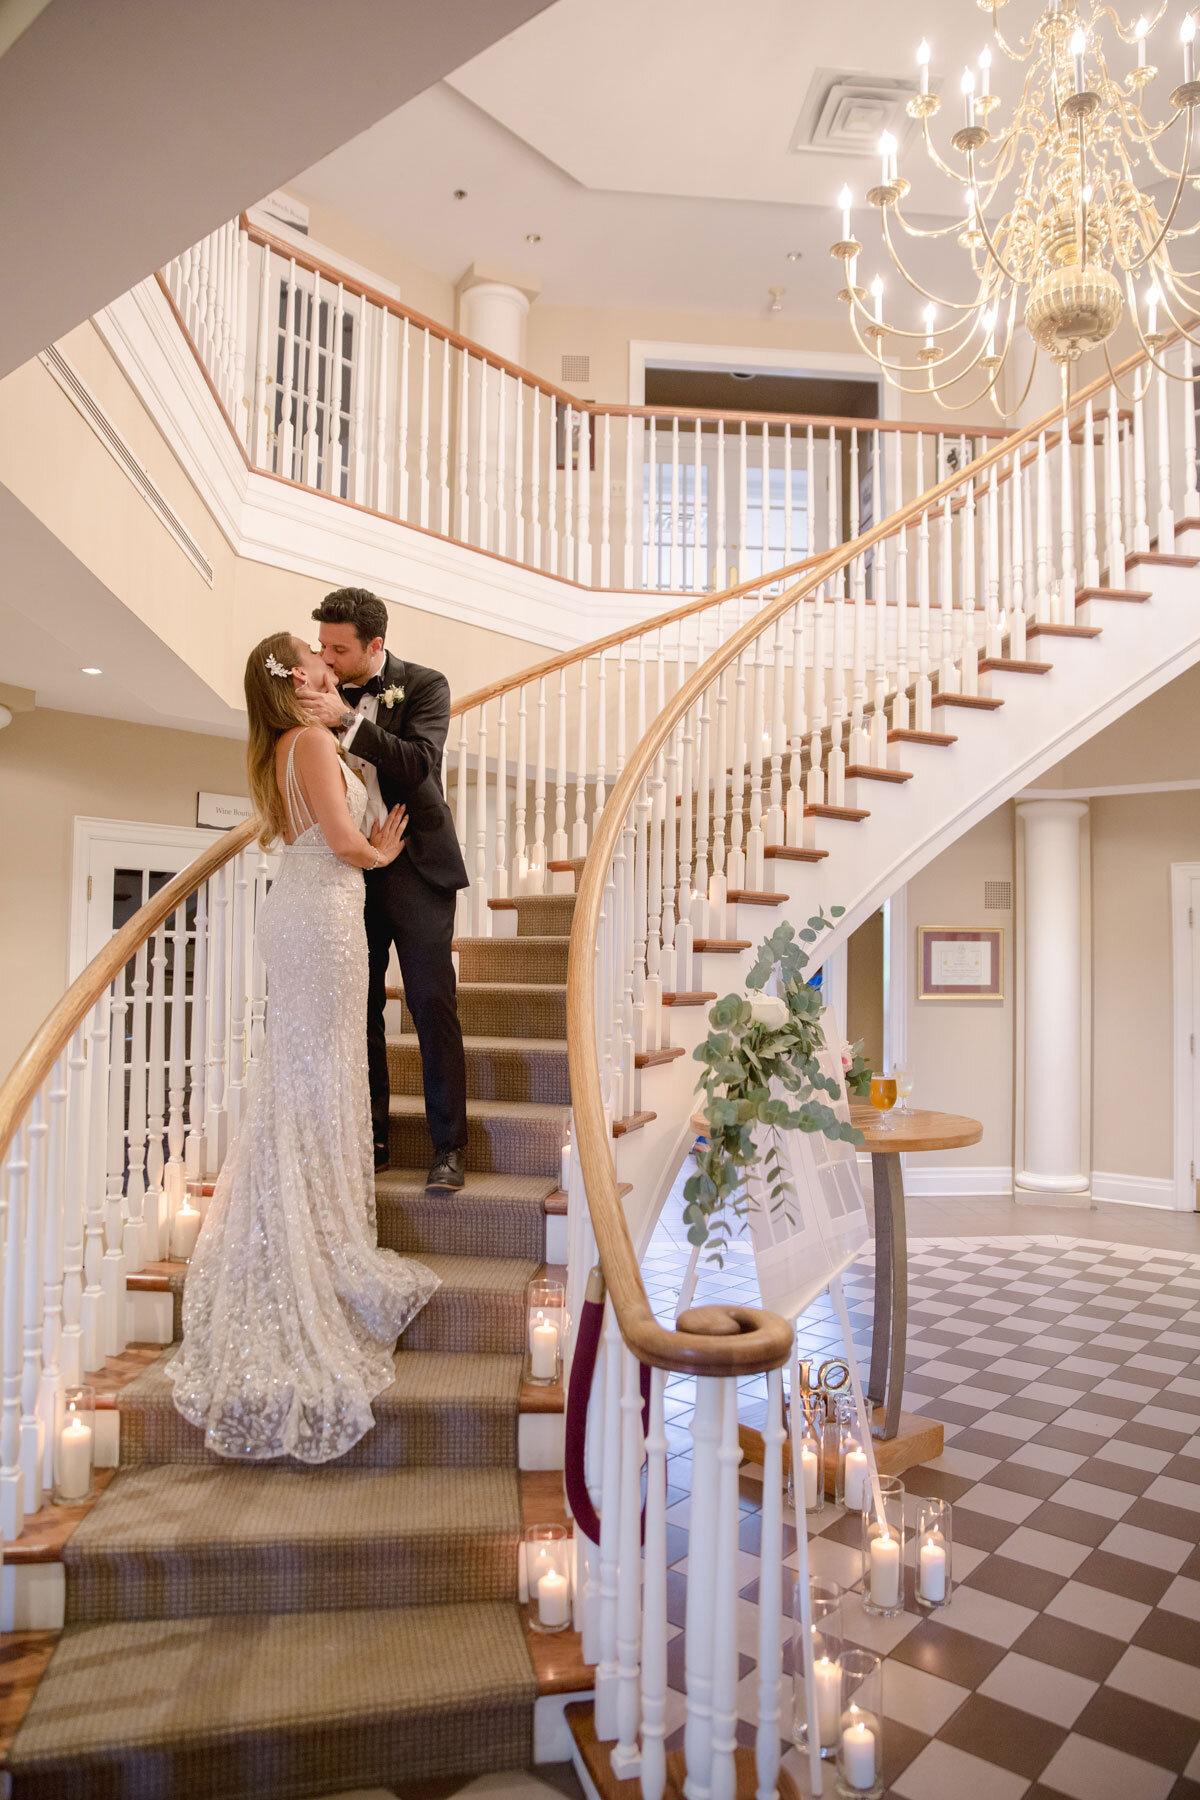 Chateau-des-Charmes-Wedding-Summer-Vineyard-Bride-Niagara-on-the-Lake-photos-by-Gemini-Photography-Ontario-0067.jpg